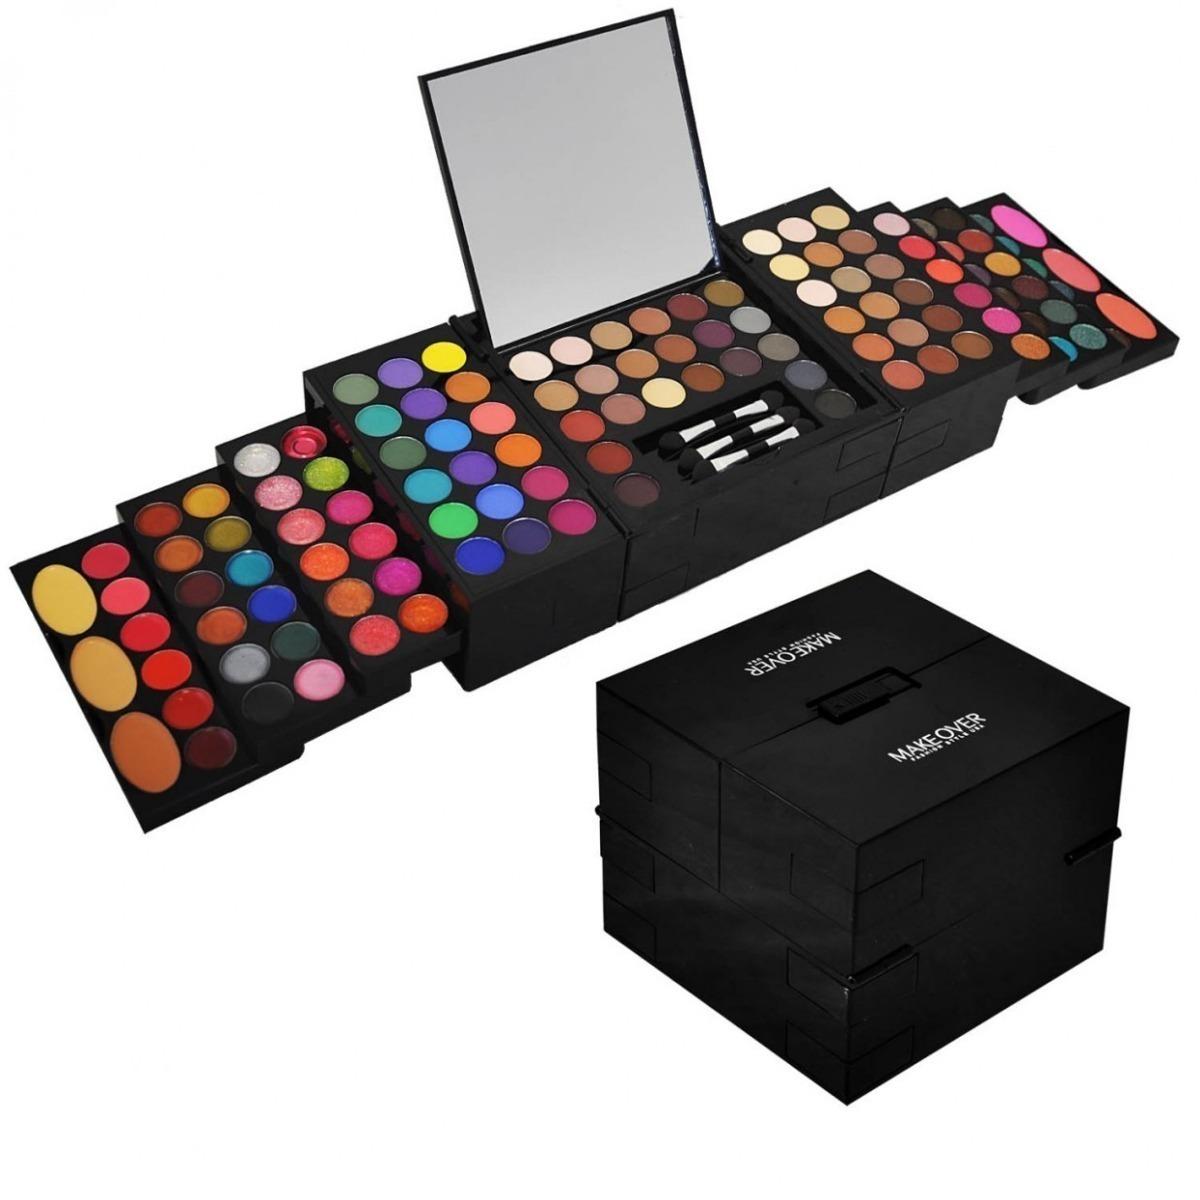 1c5b61496 set de maquillaje profesional makeover 178 tablero sombras. Cargando zoom.